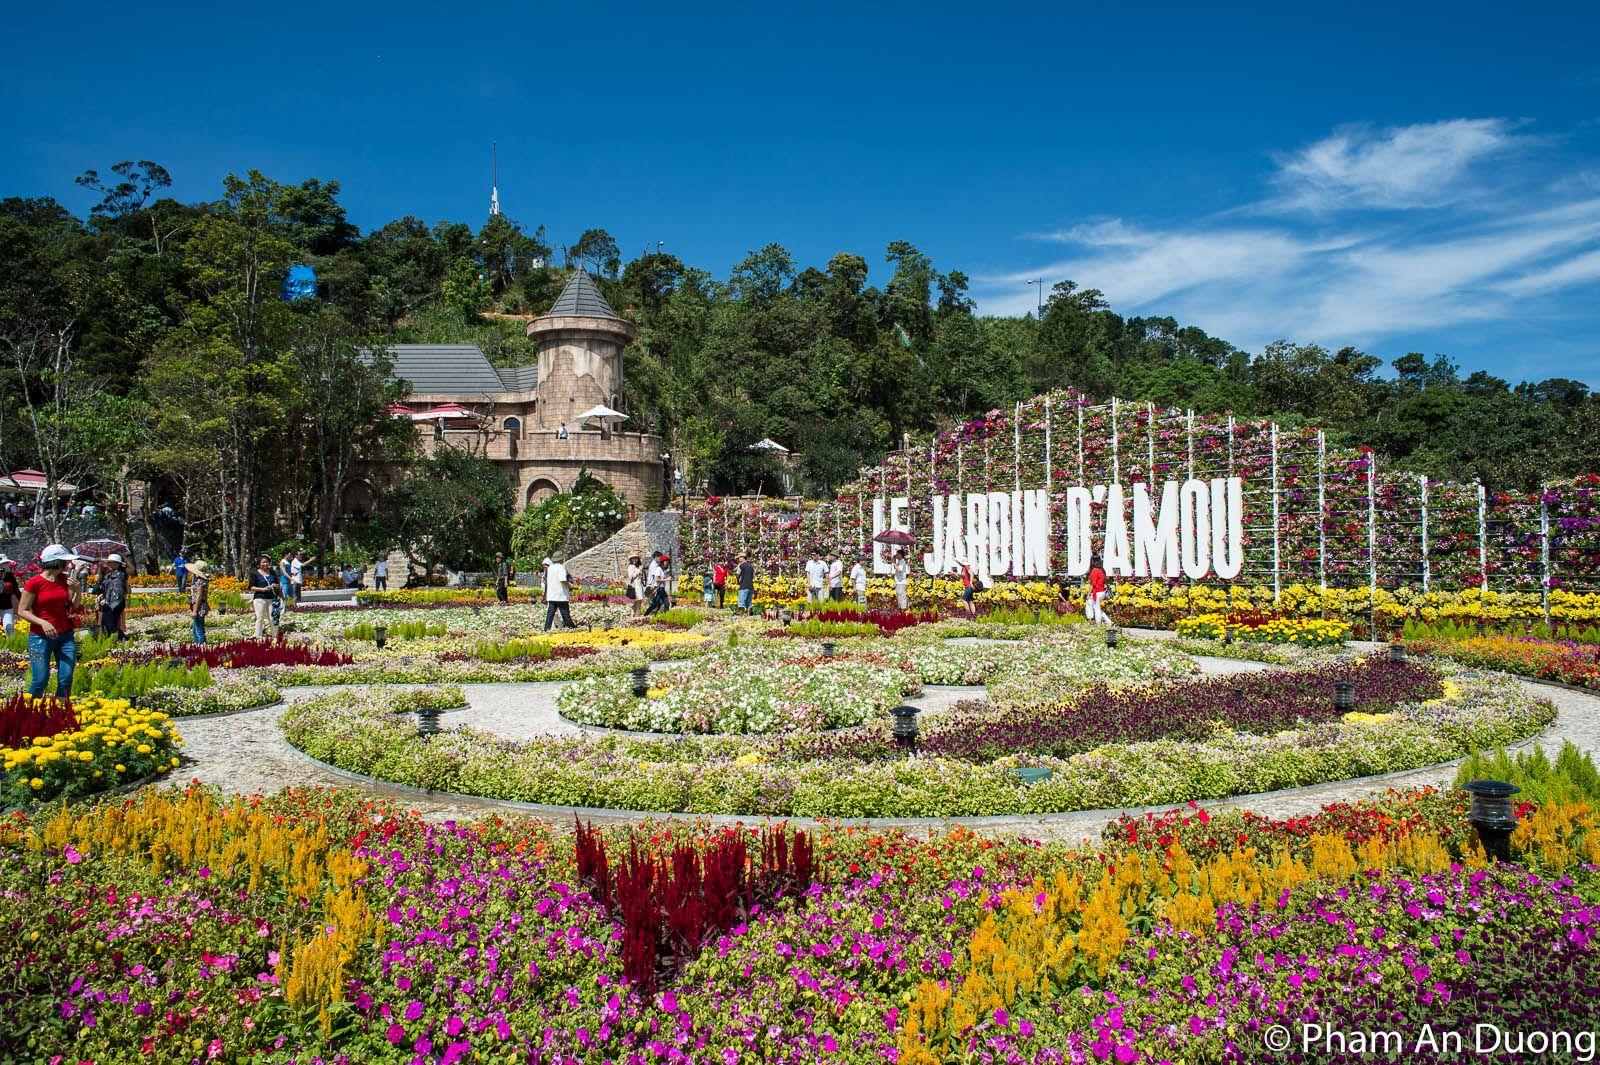 Le-Jardin-Damou Du lịch Bà Nà Hills Du lich Ba na